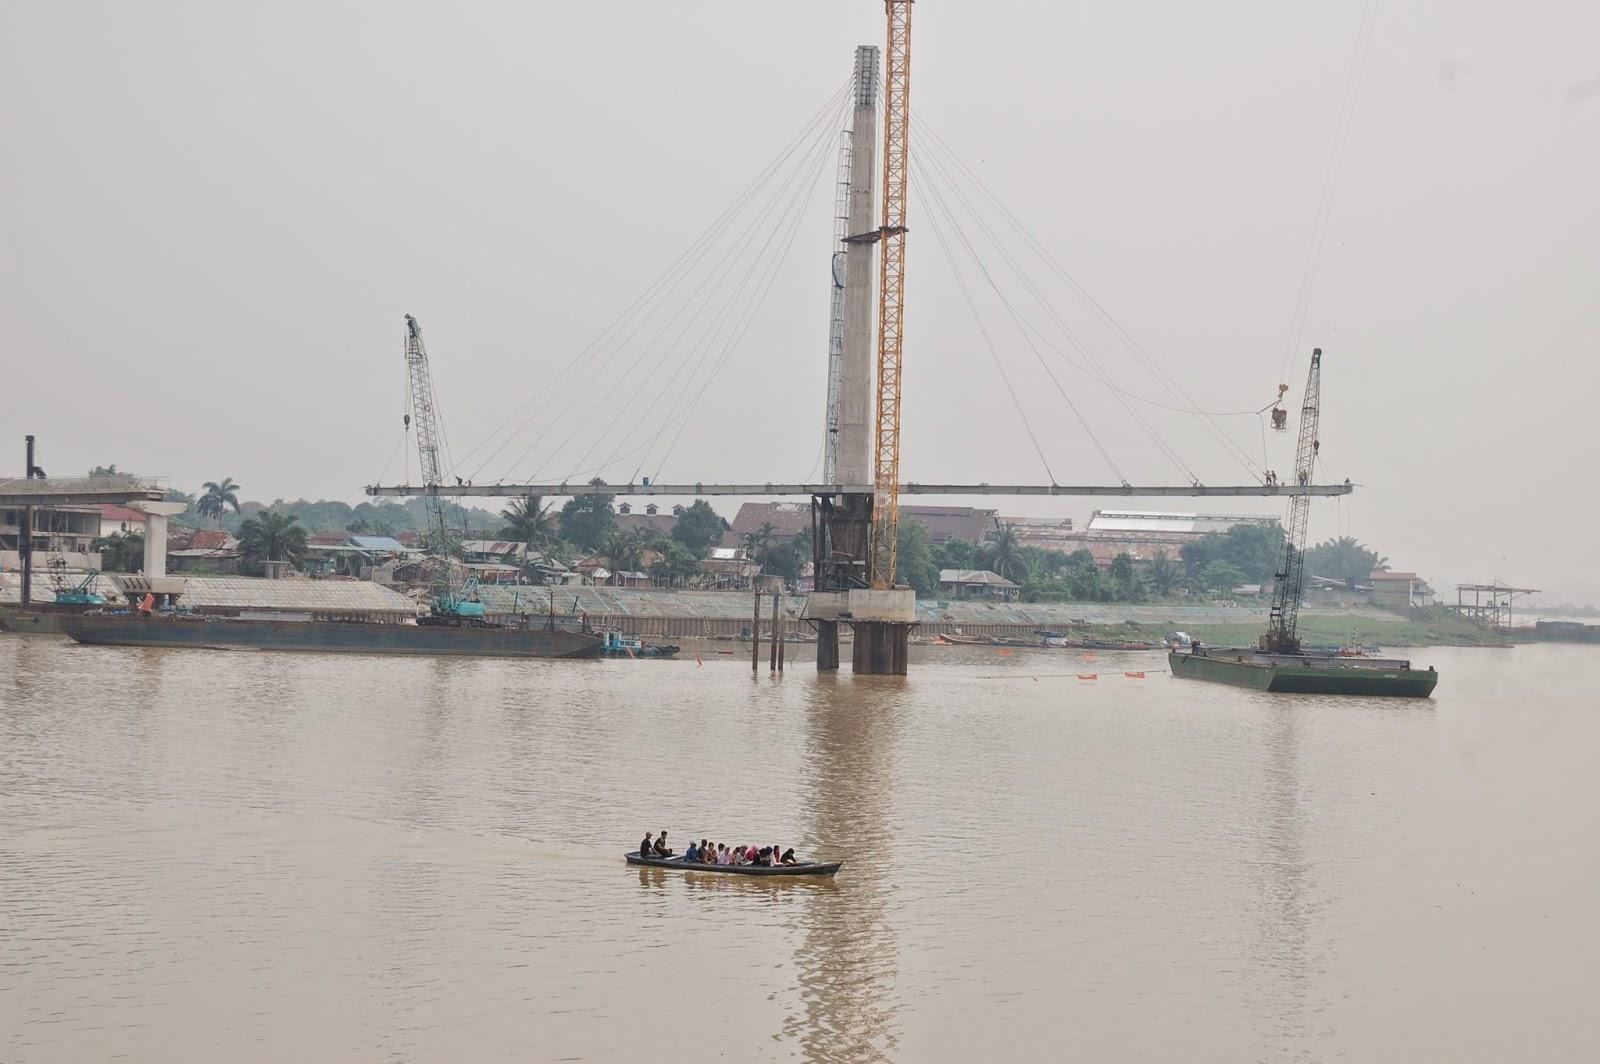 Beritaku Pembangunan Jembatan Pedestrian Gentala Arasy Molor Kota Jambi